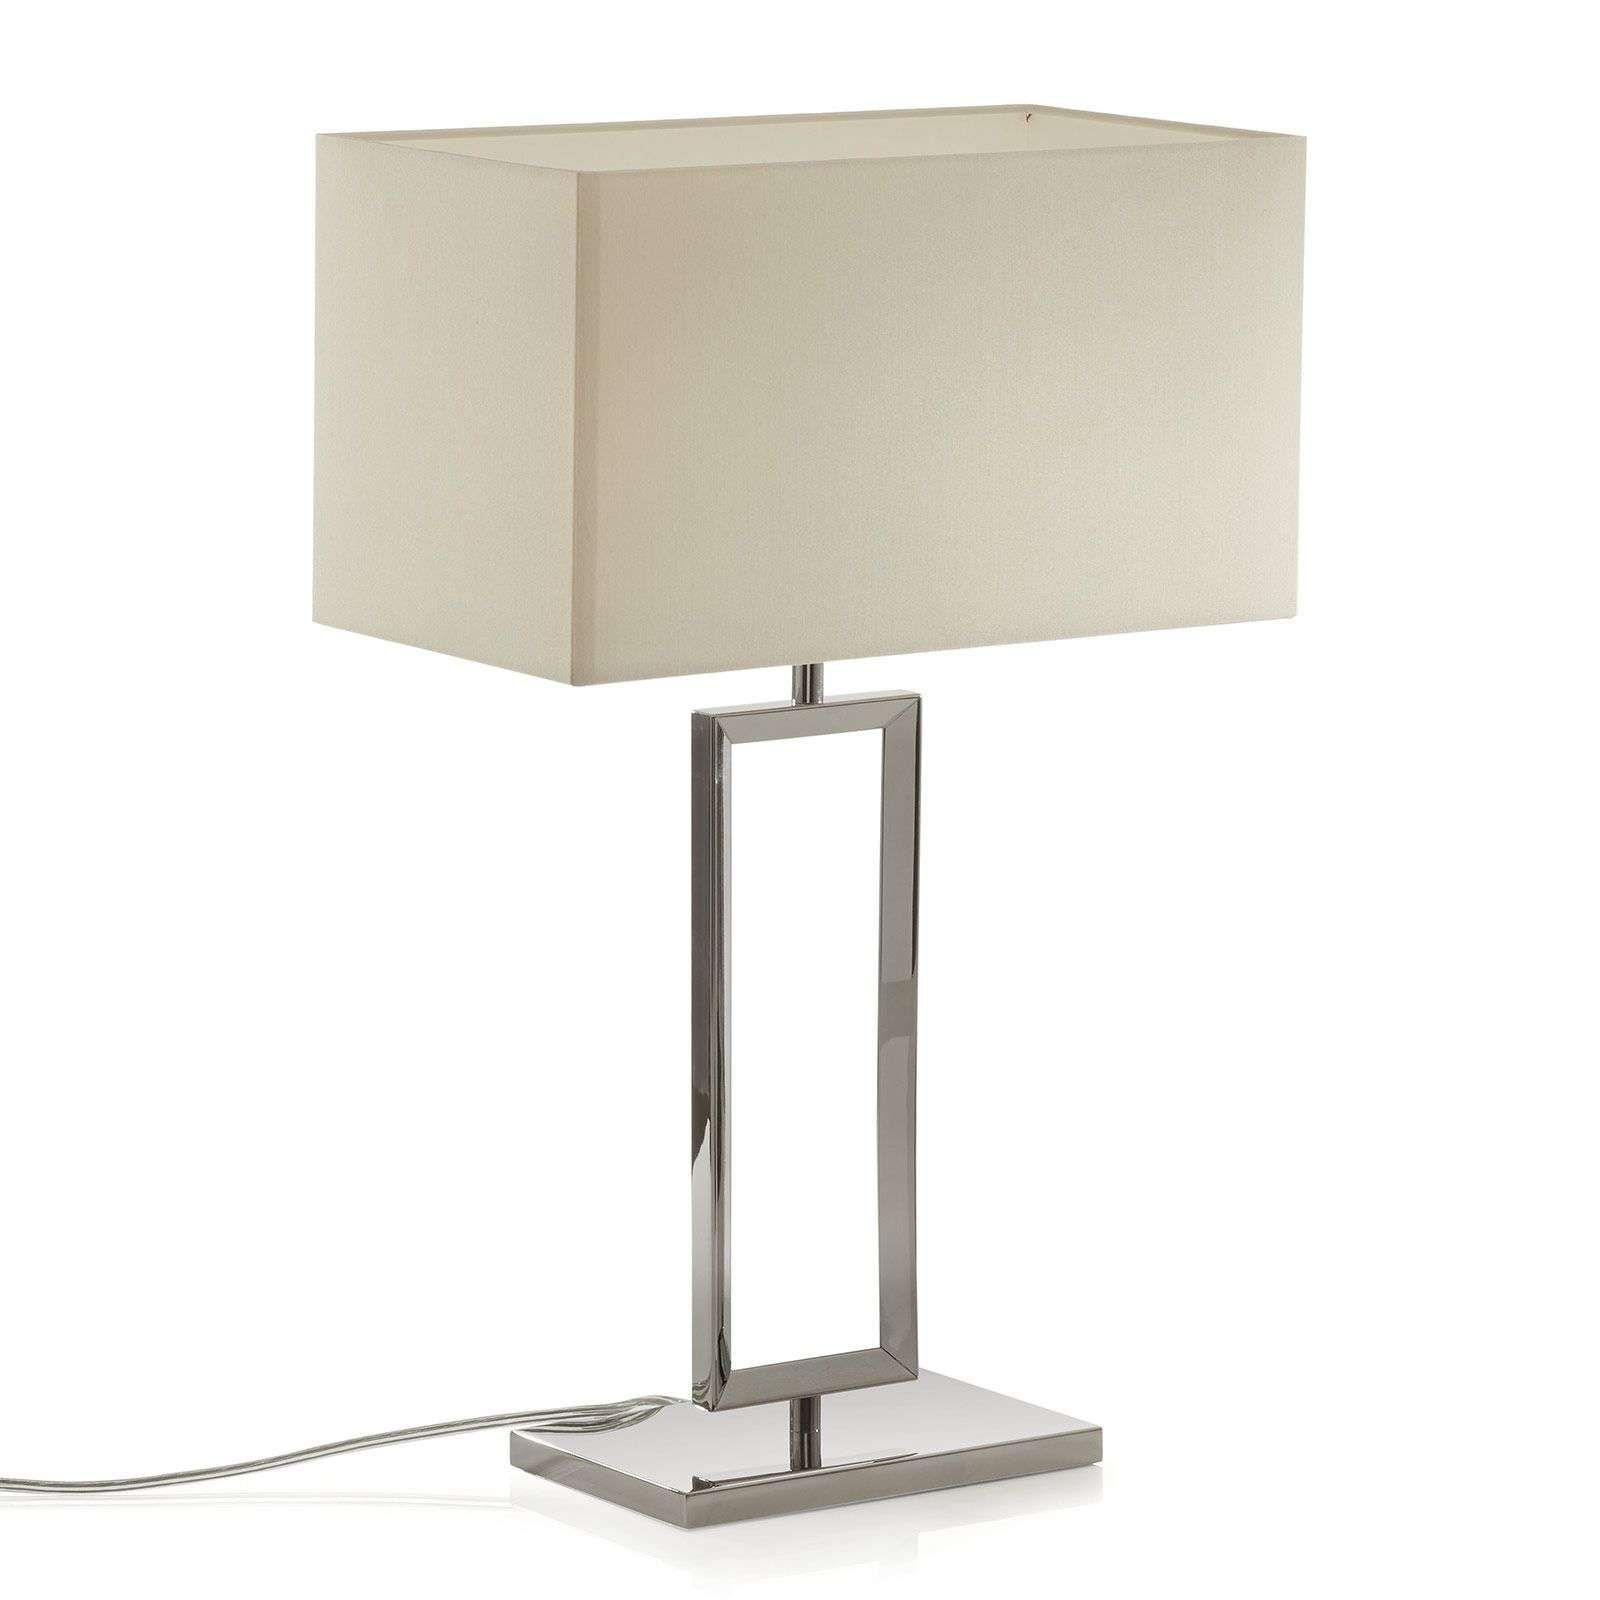 Grote Tafellamp Pad 53 5 Cm Lampentisch Grosse Tischlampen Lampenschirm Aus Stoff